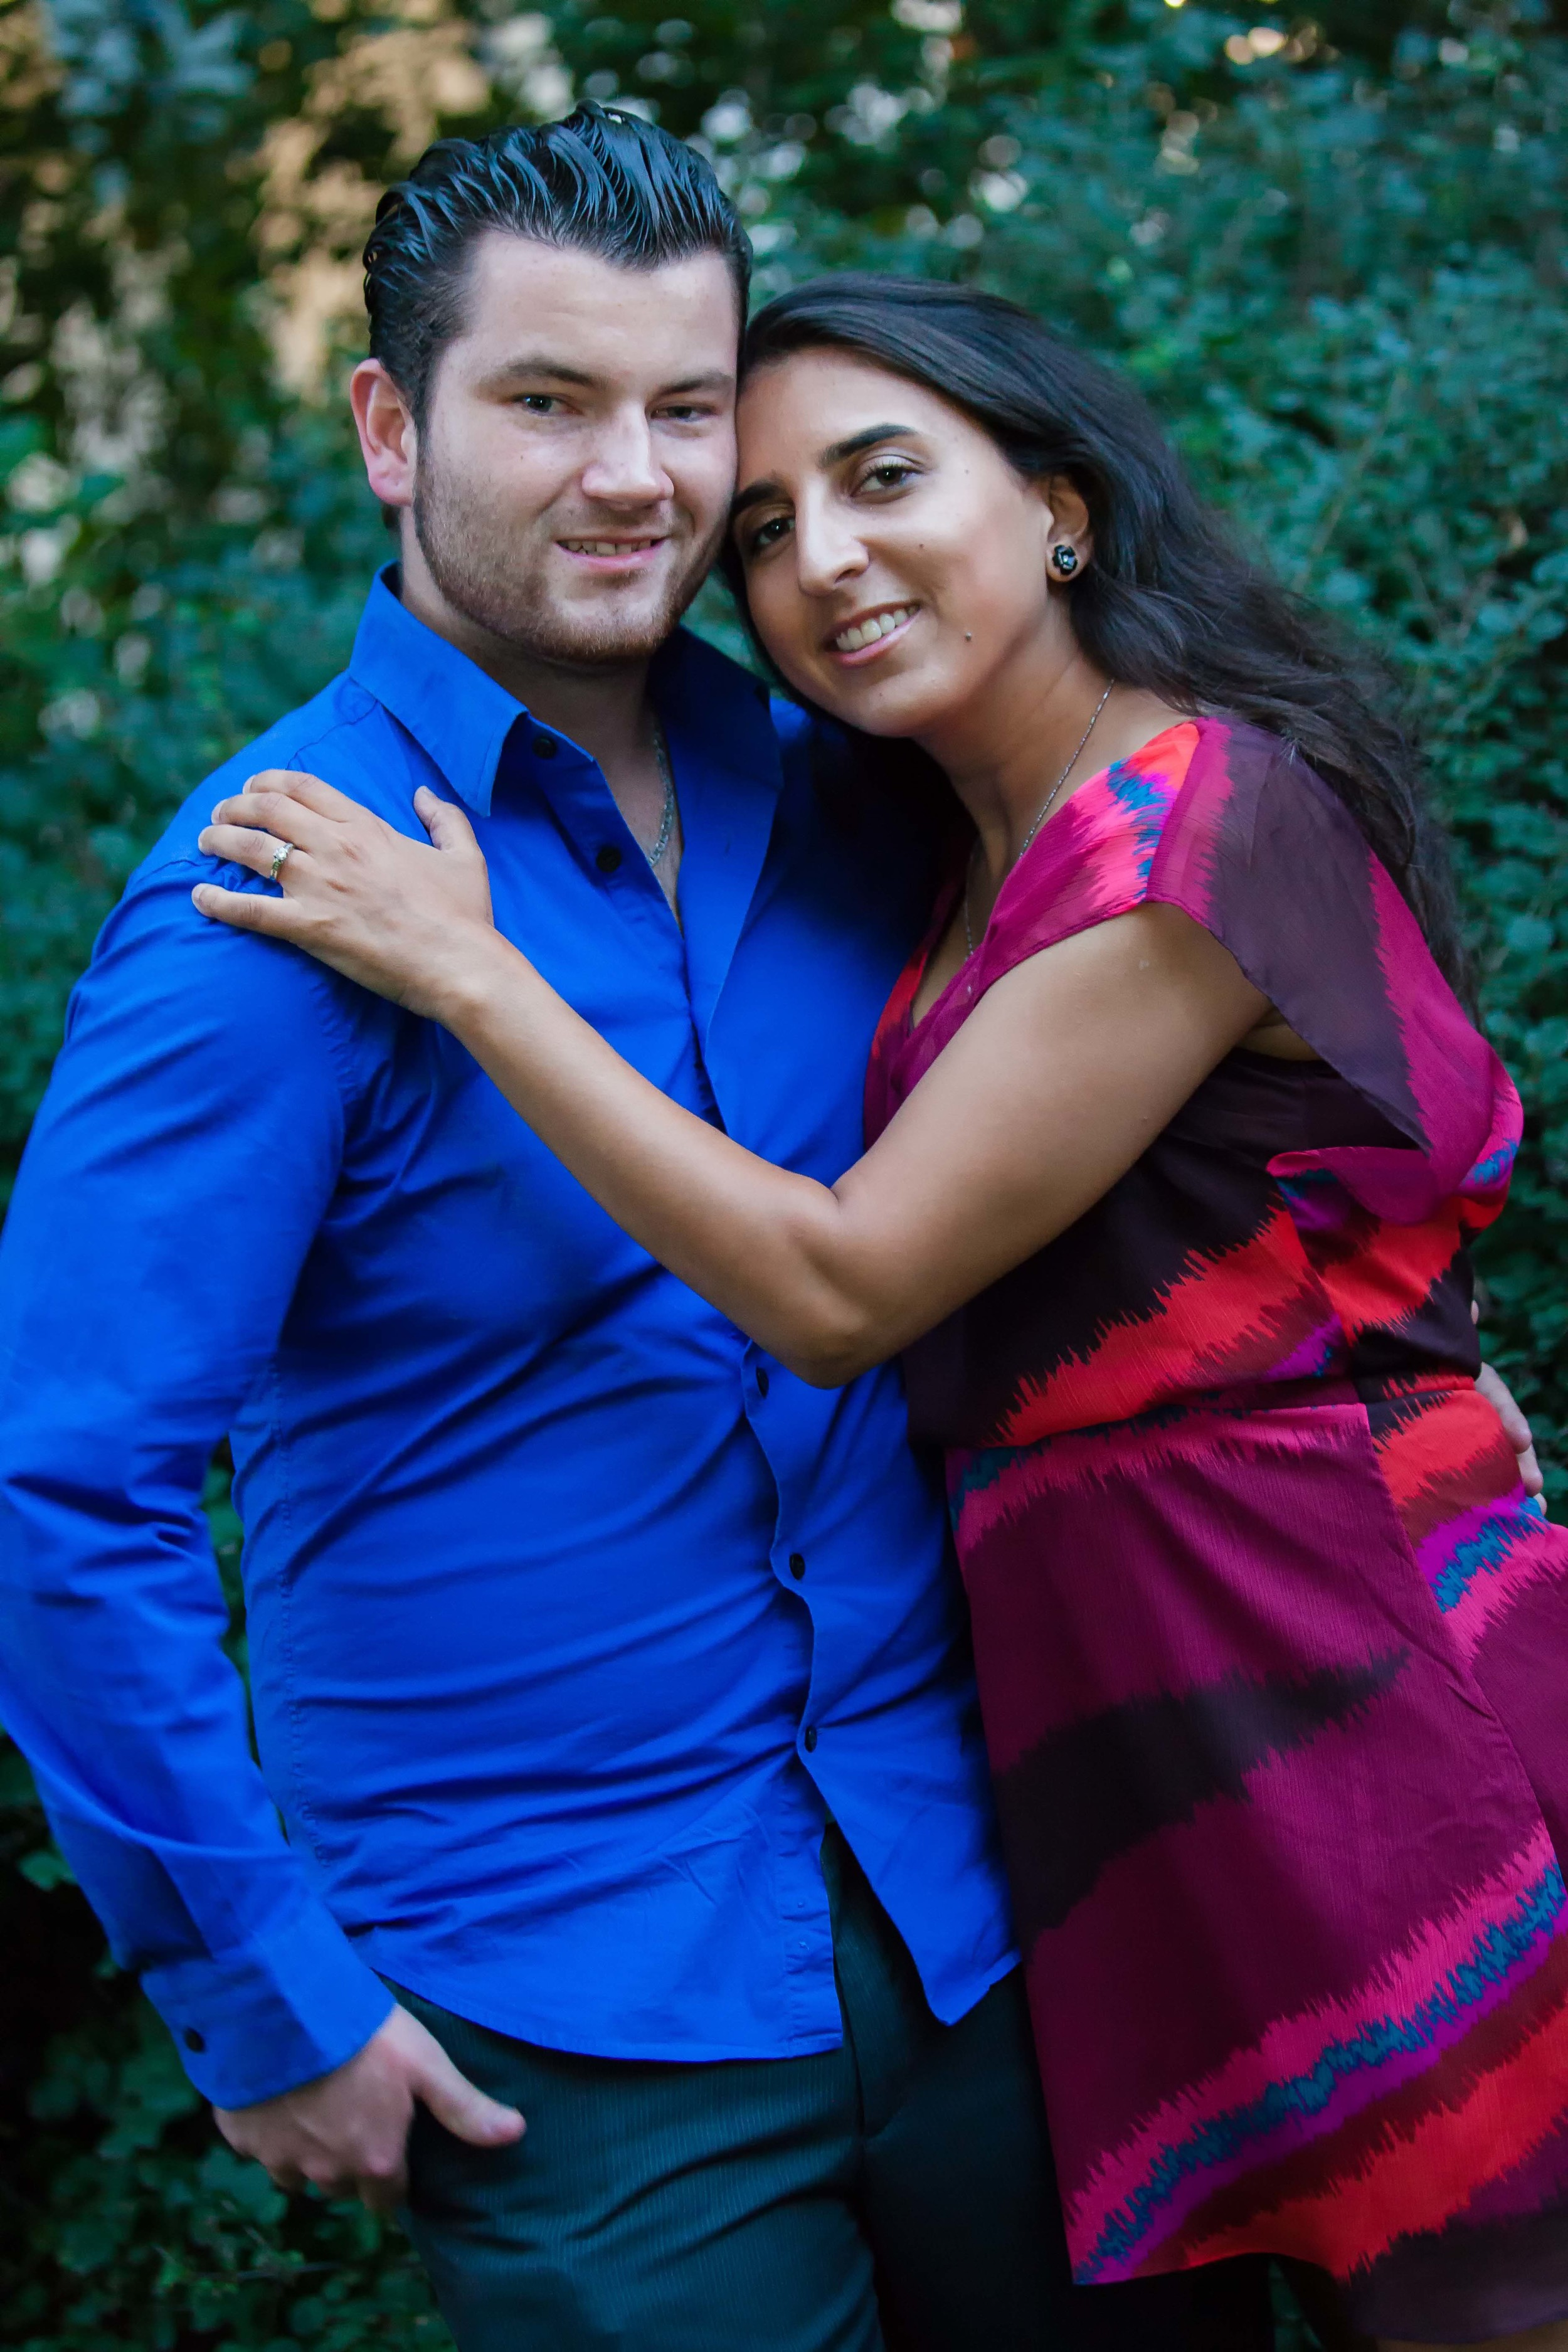 Toronto_Wedding_Photography_Steph&Kyle_eng-11